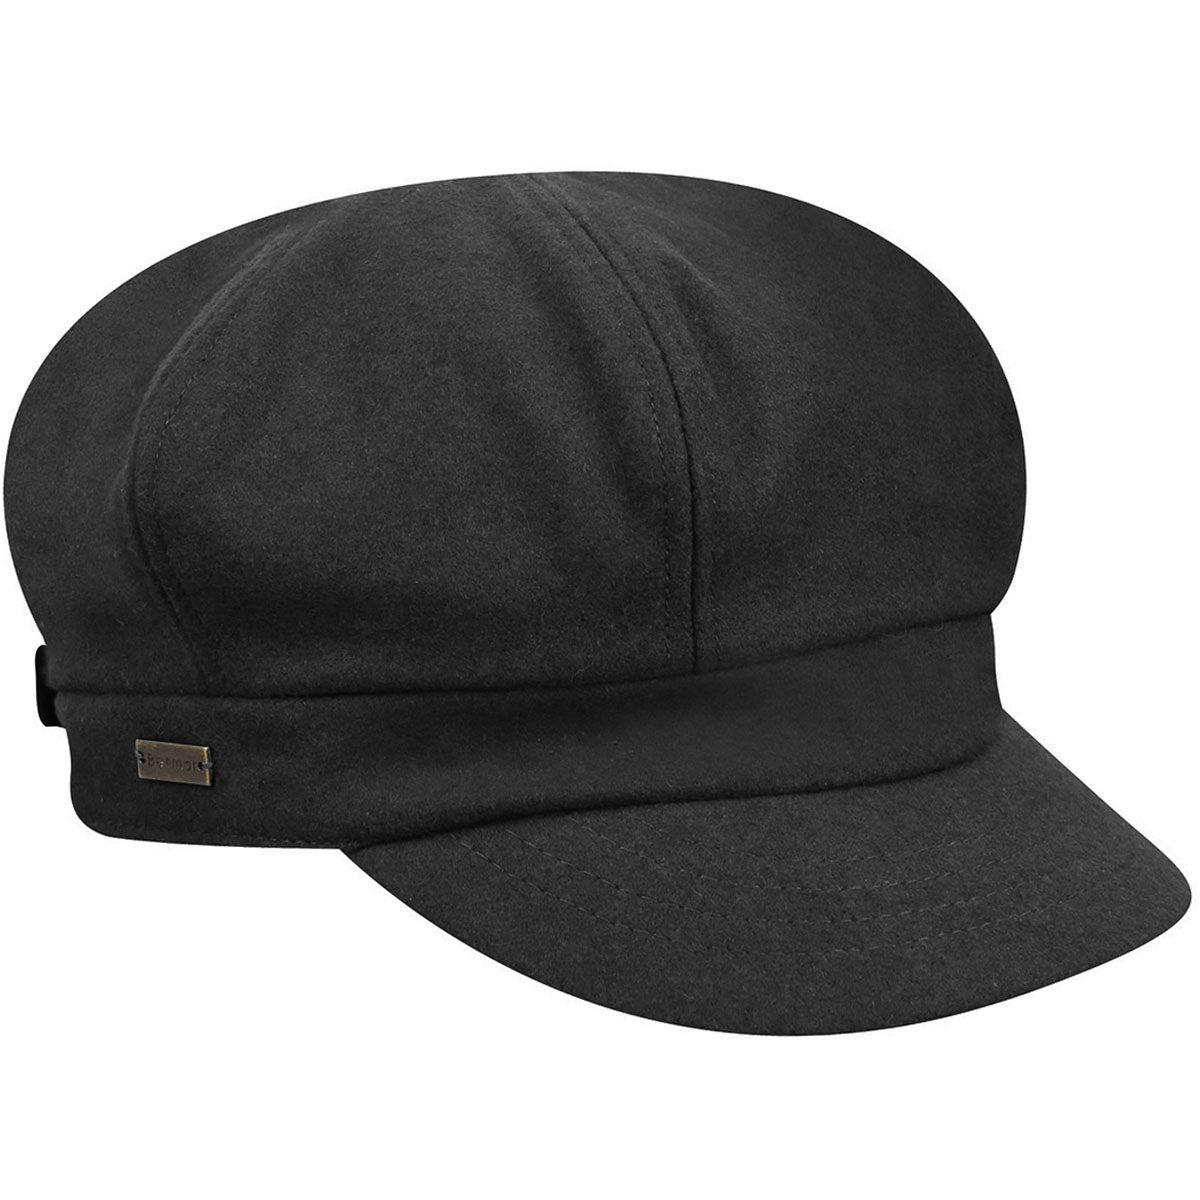 Betmar Boy Meets Girl Cap in Black